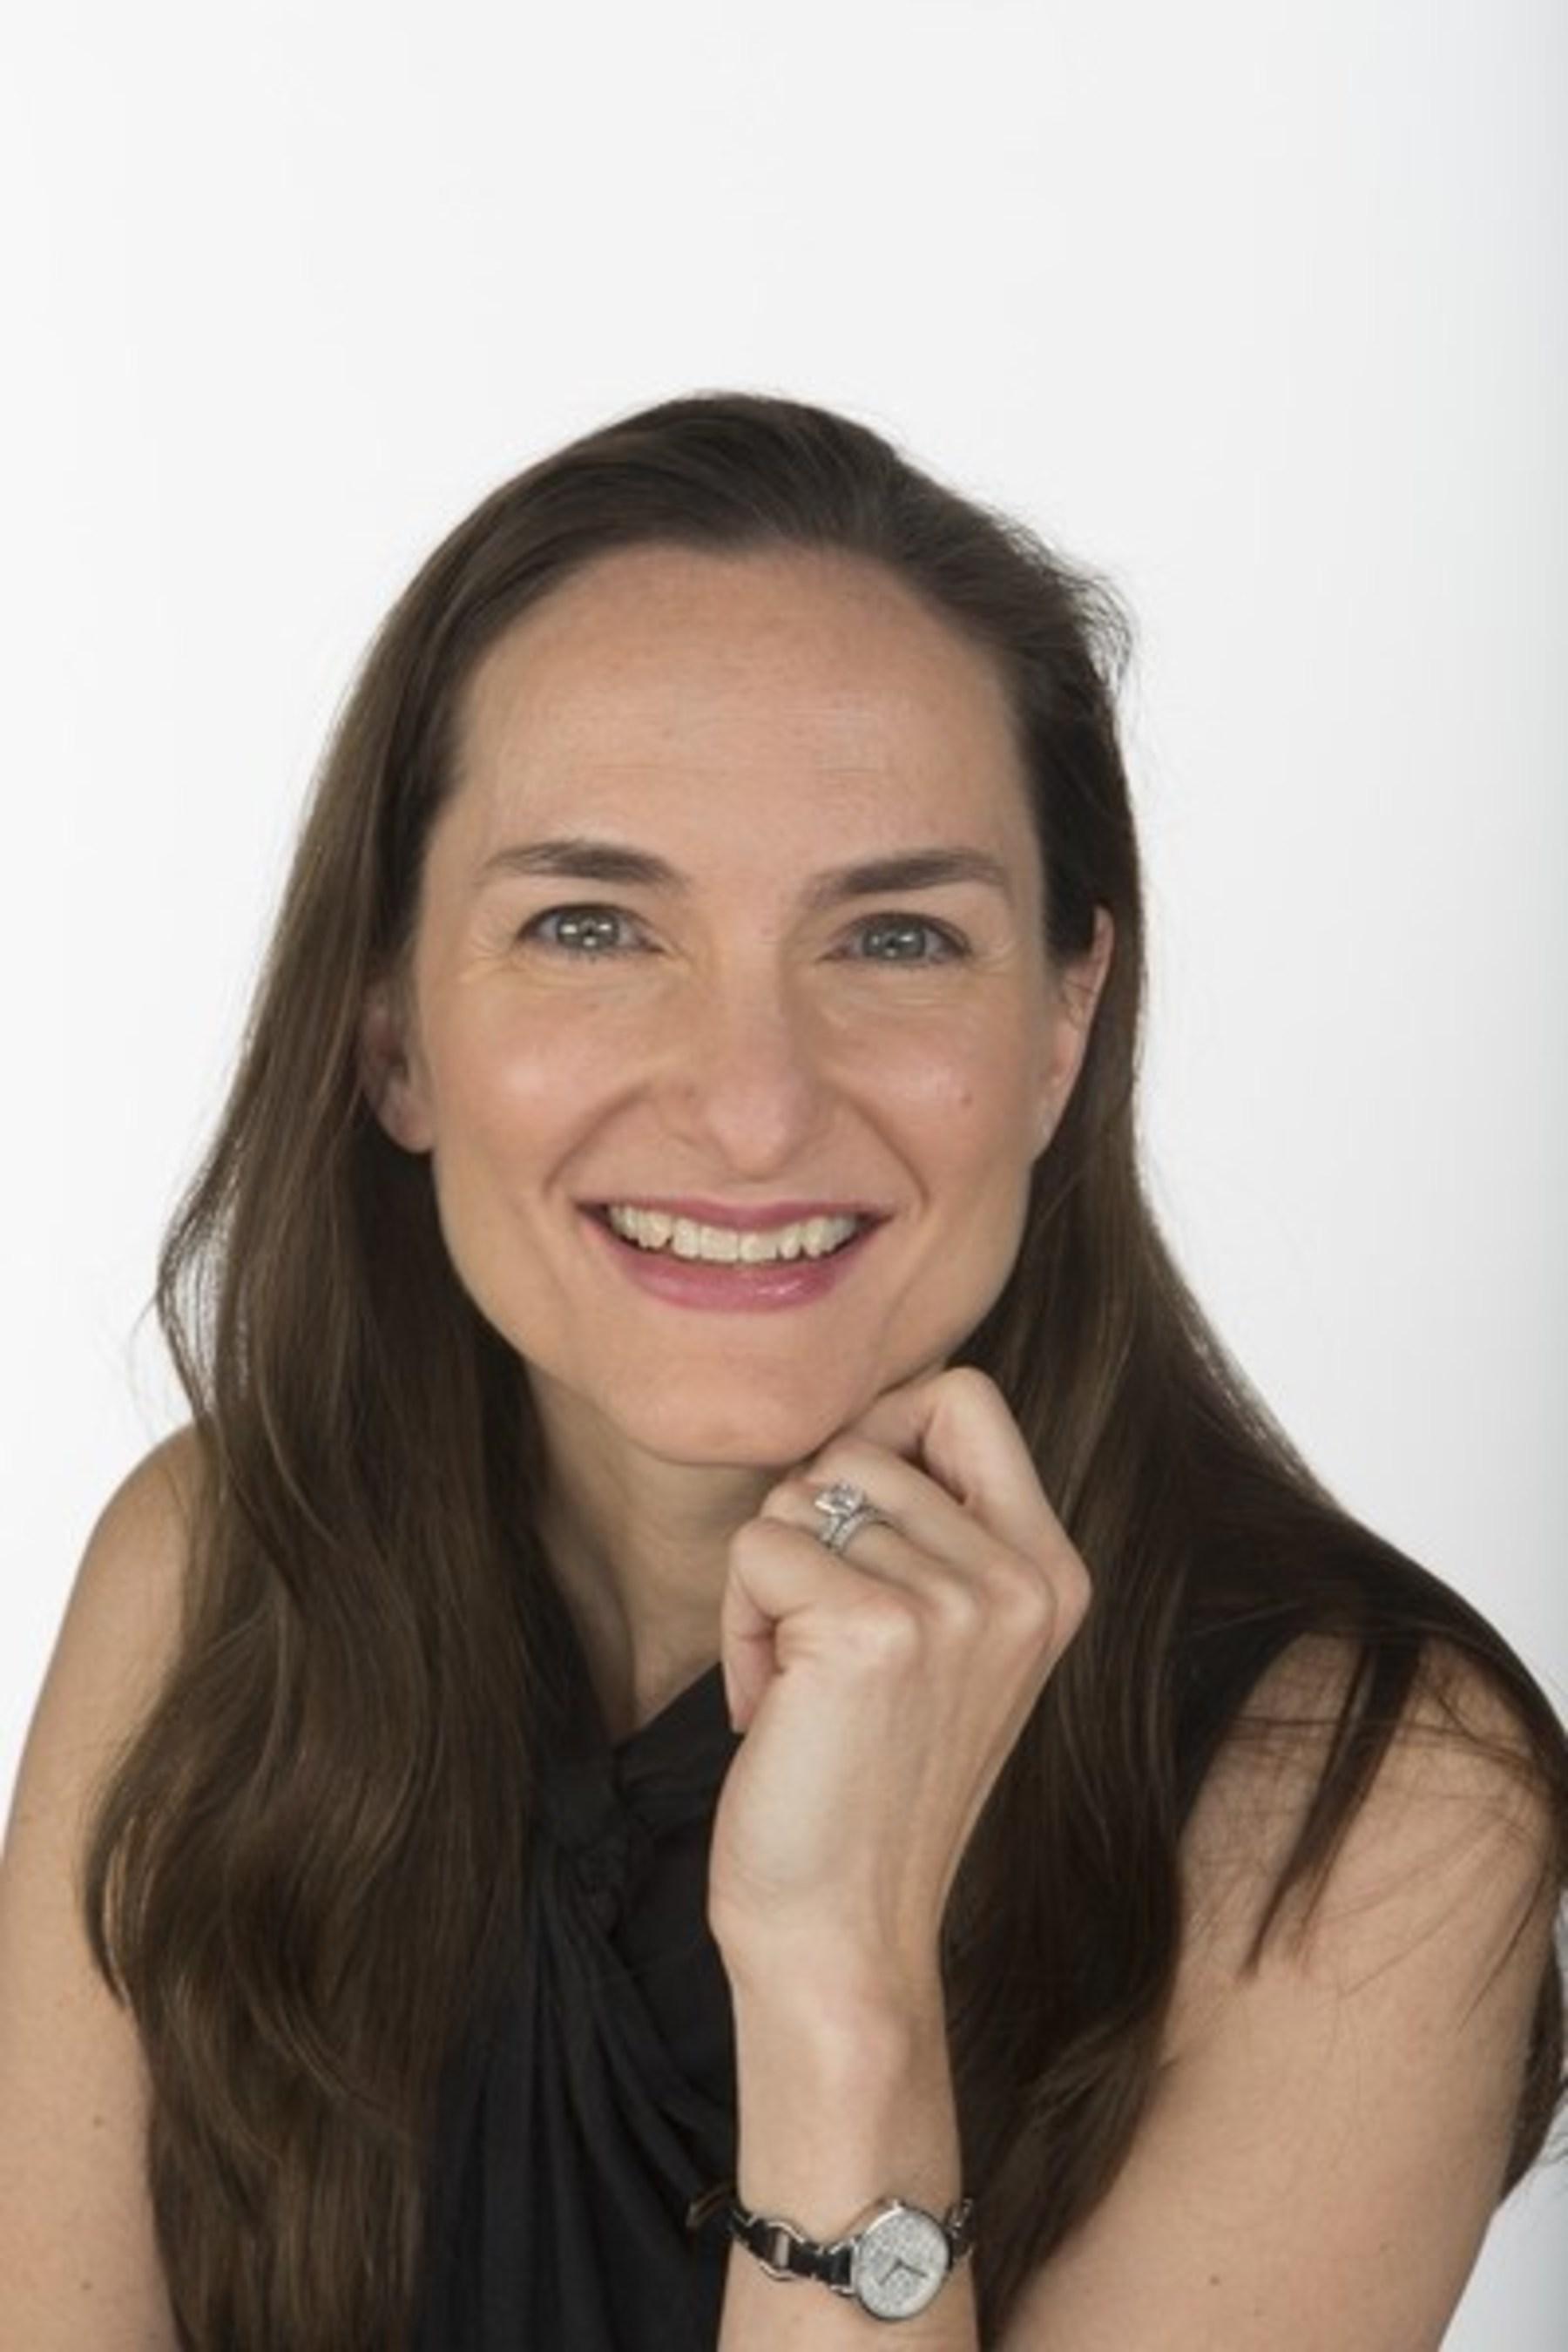 Angelique Bellmer Krembs